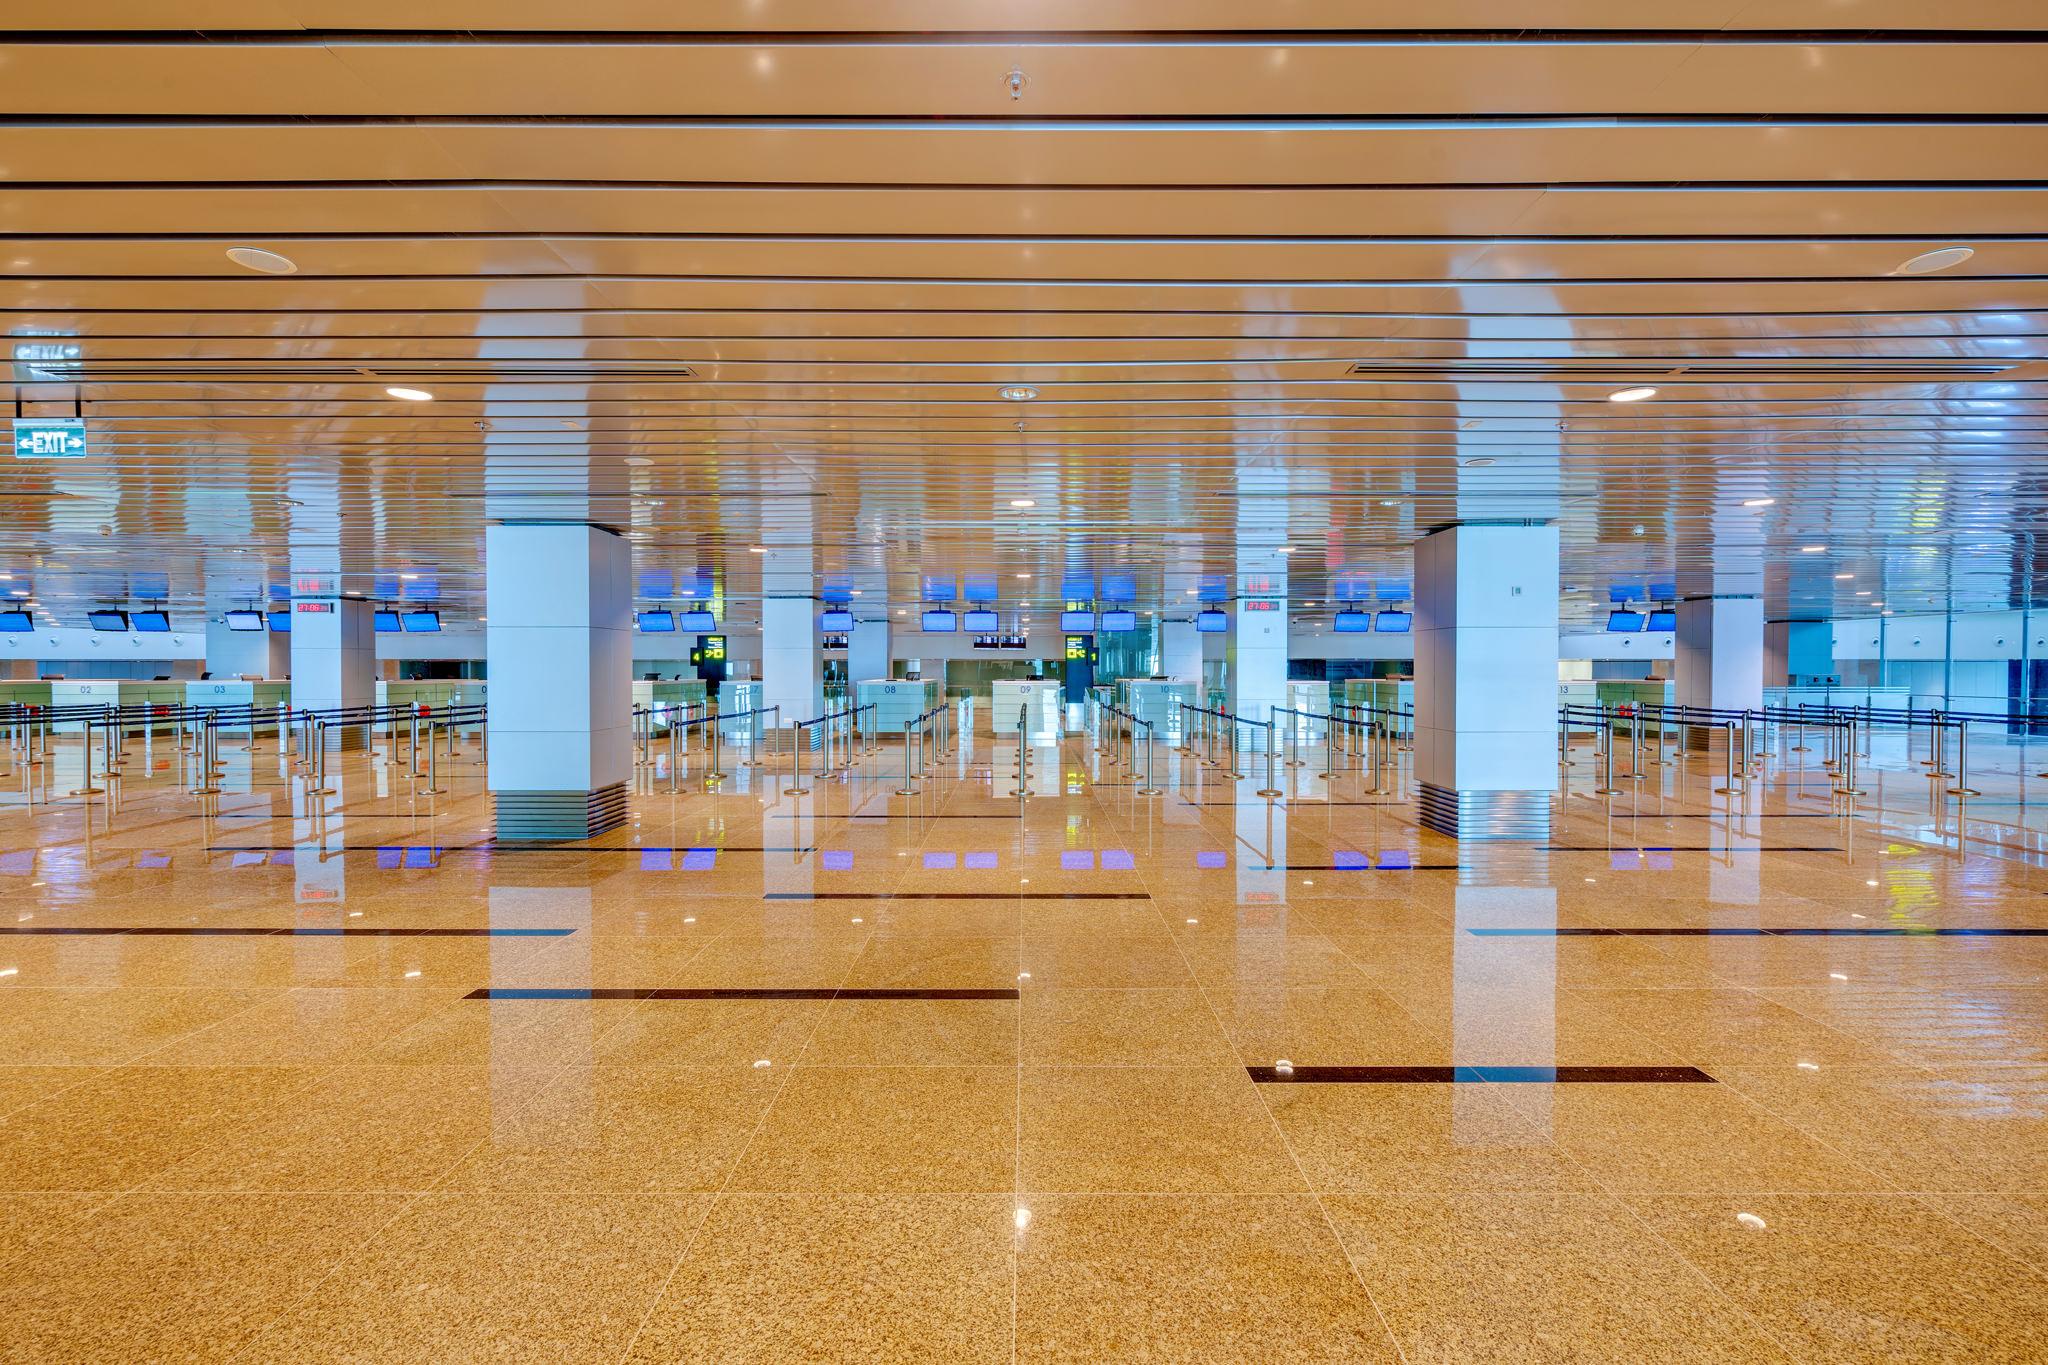 20180626 - Cam Ranh Airport - Architecture - 0161.jpg